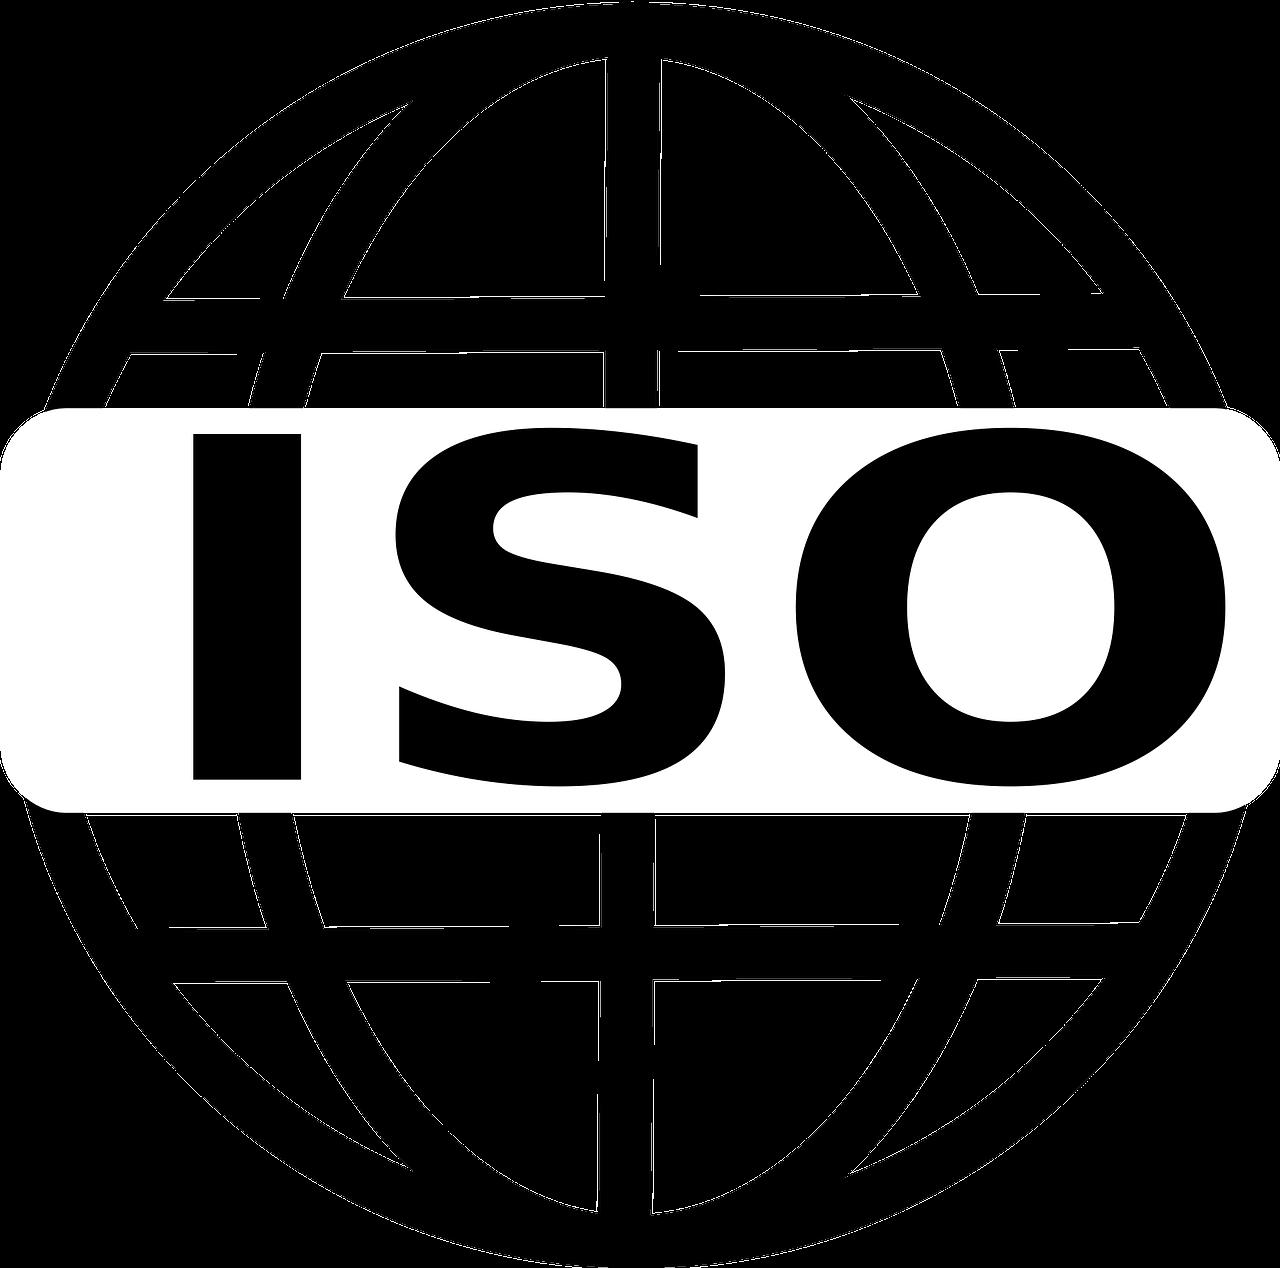 iso, standard, symbol